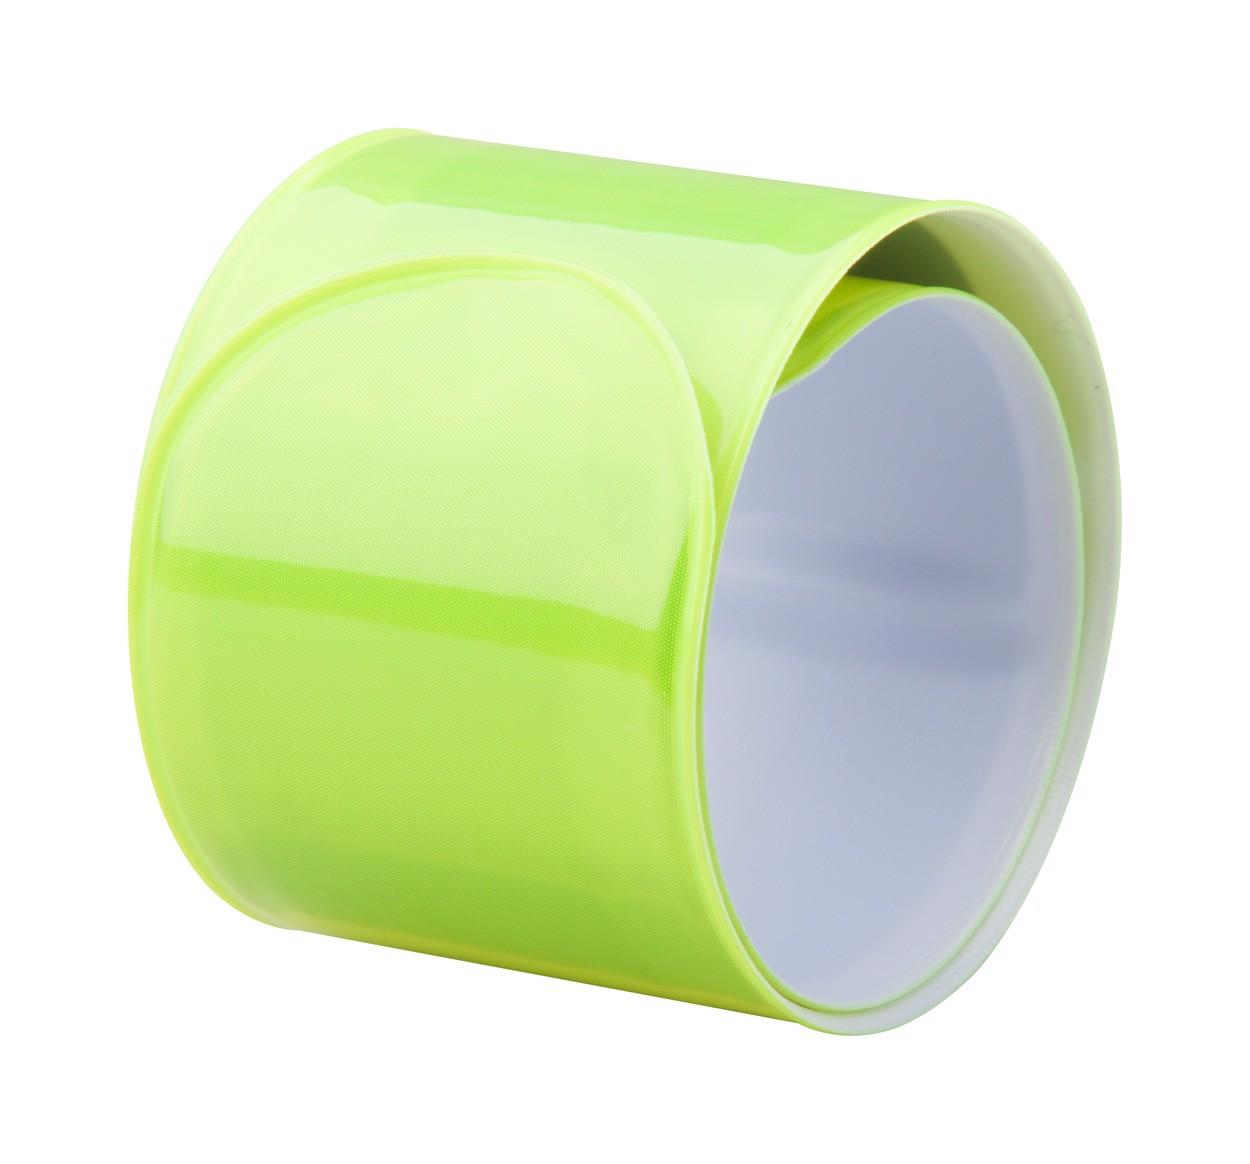 Reflexní Páska Reflective - Žlutá